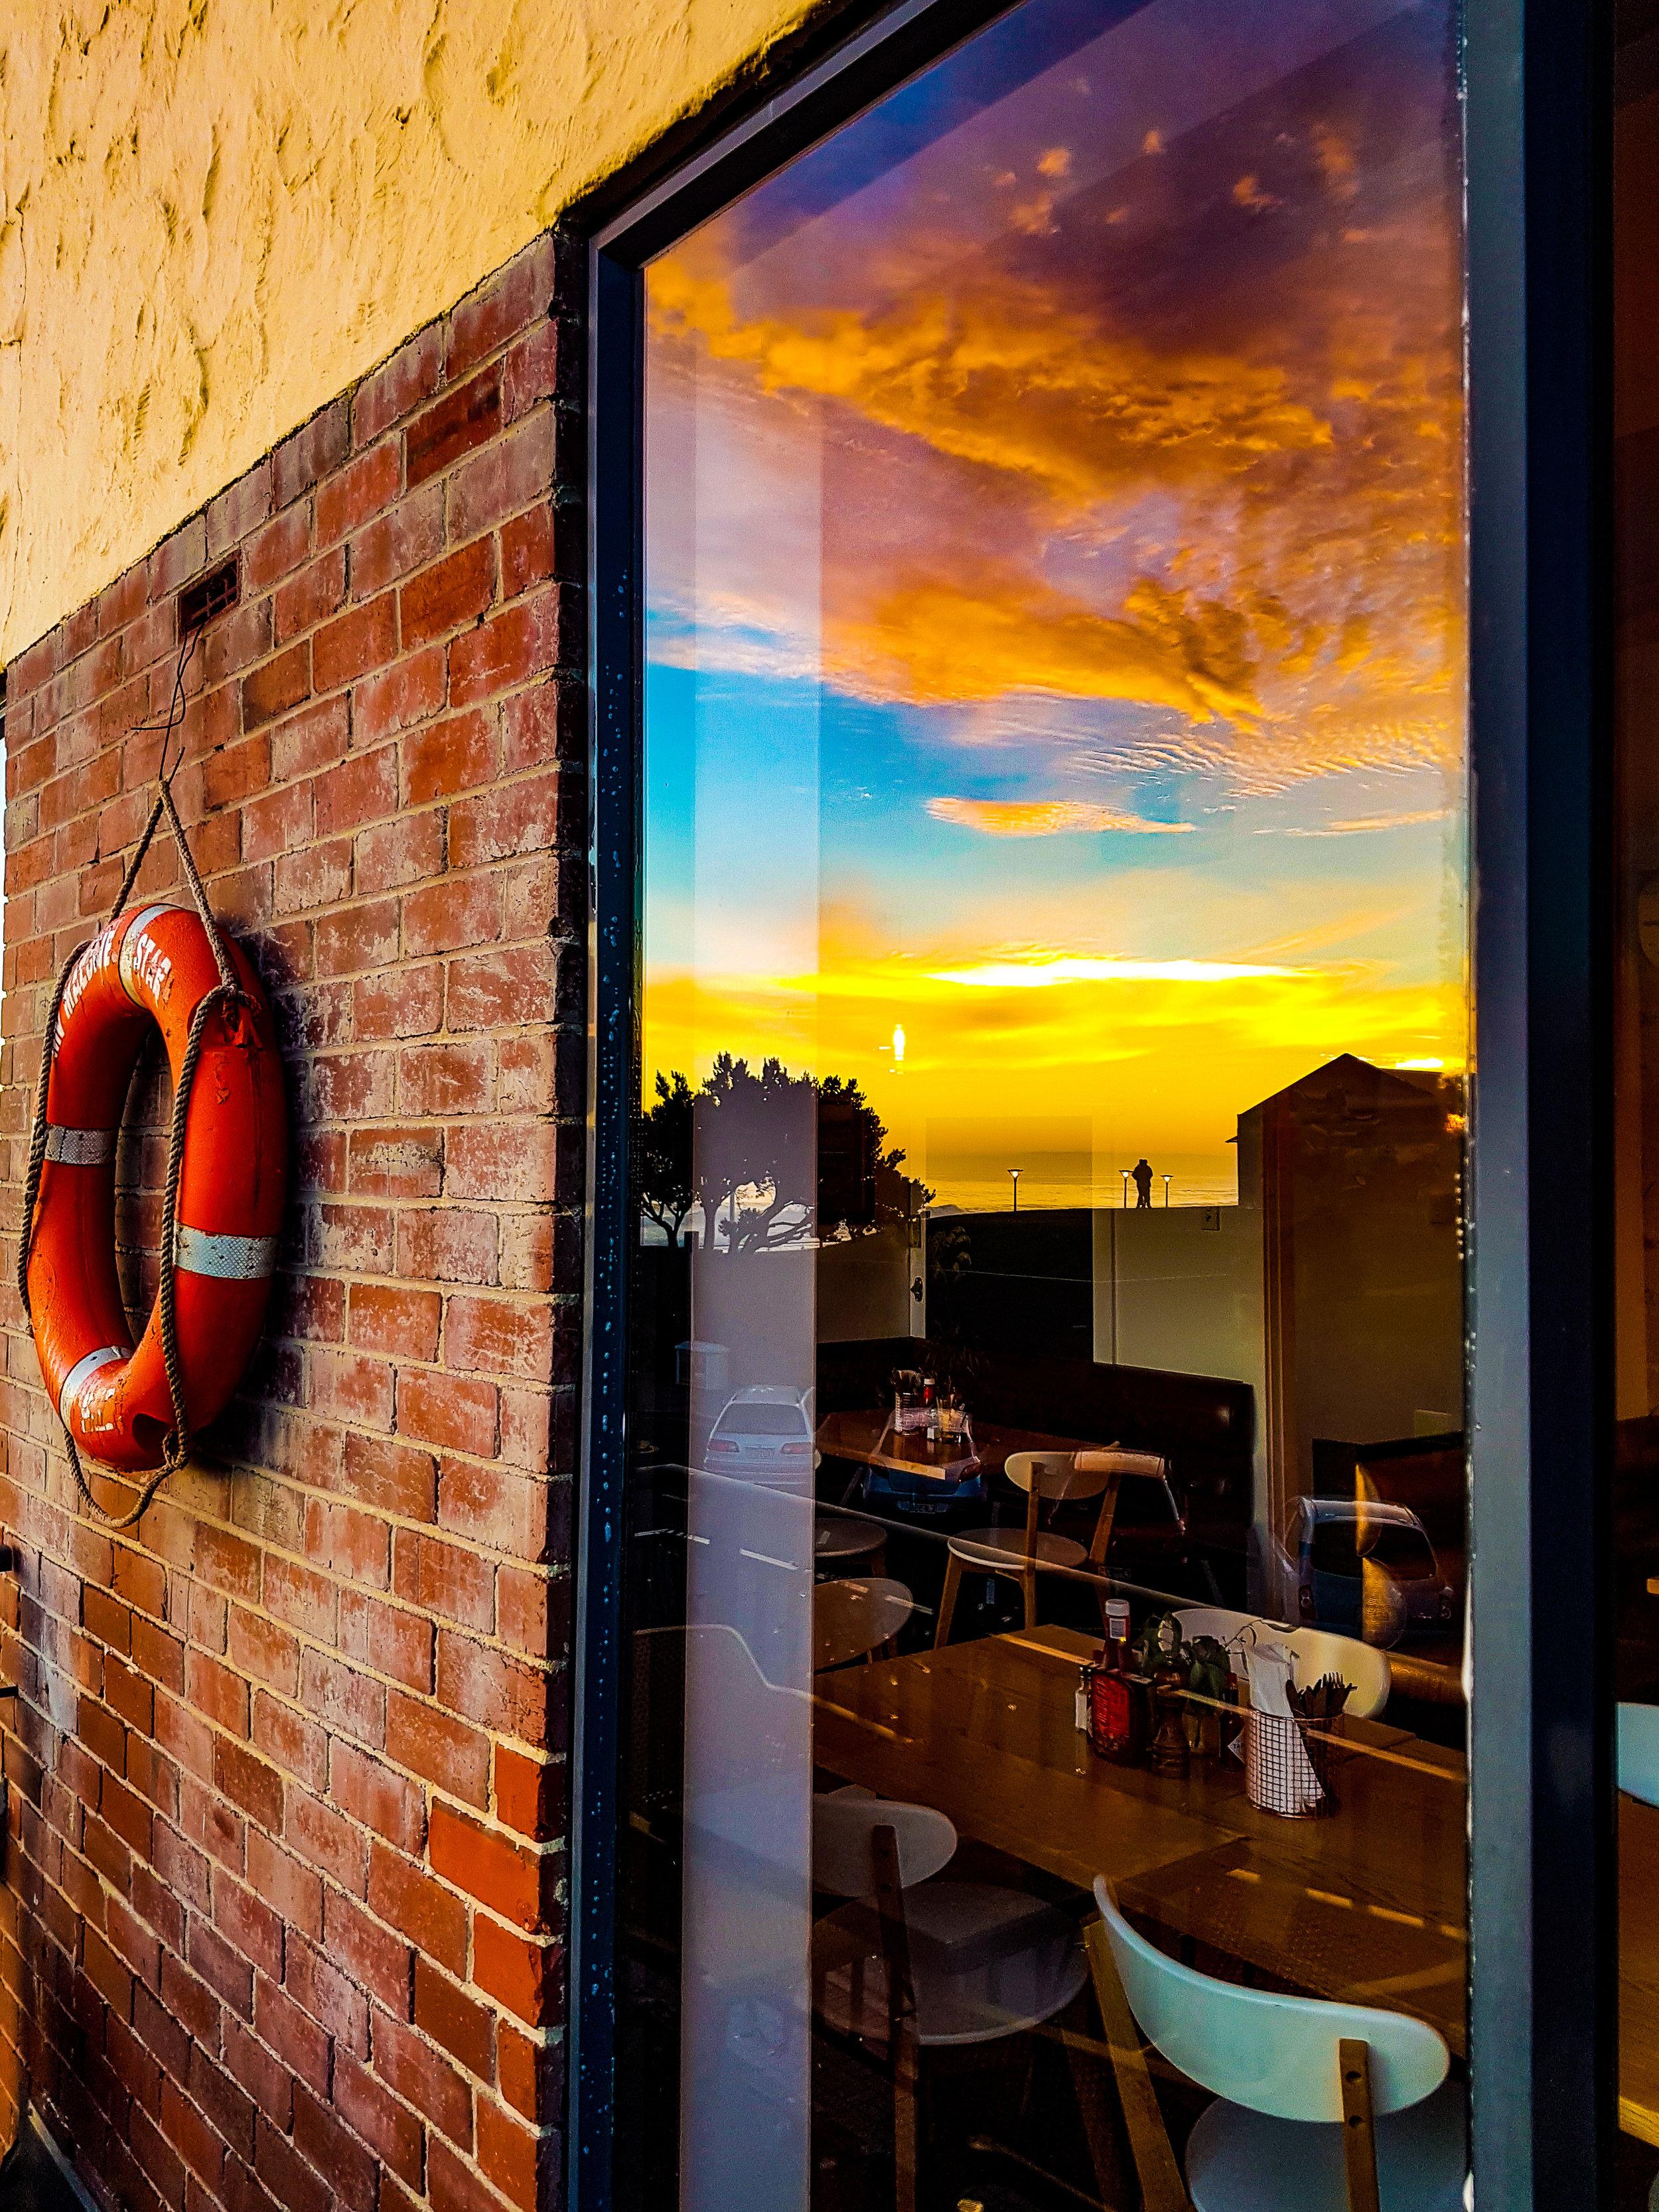 Table in the window starfish cafe Dunedin